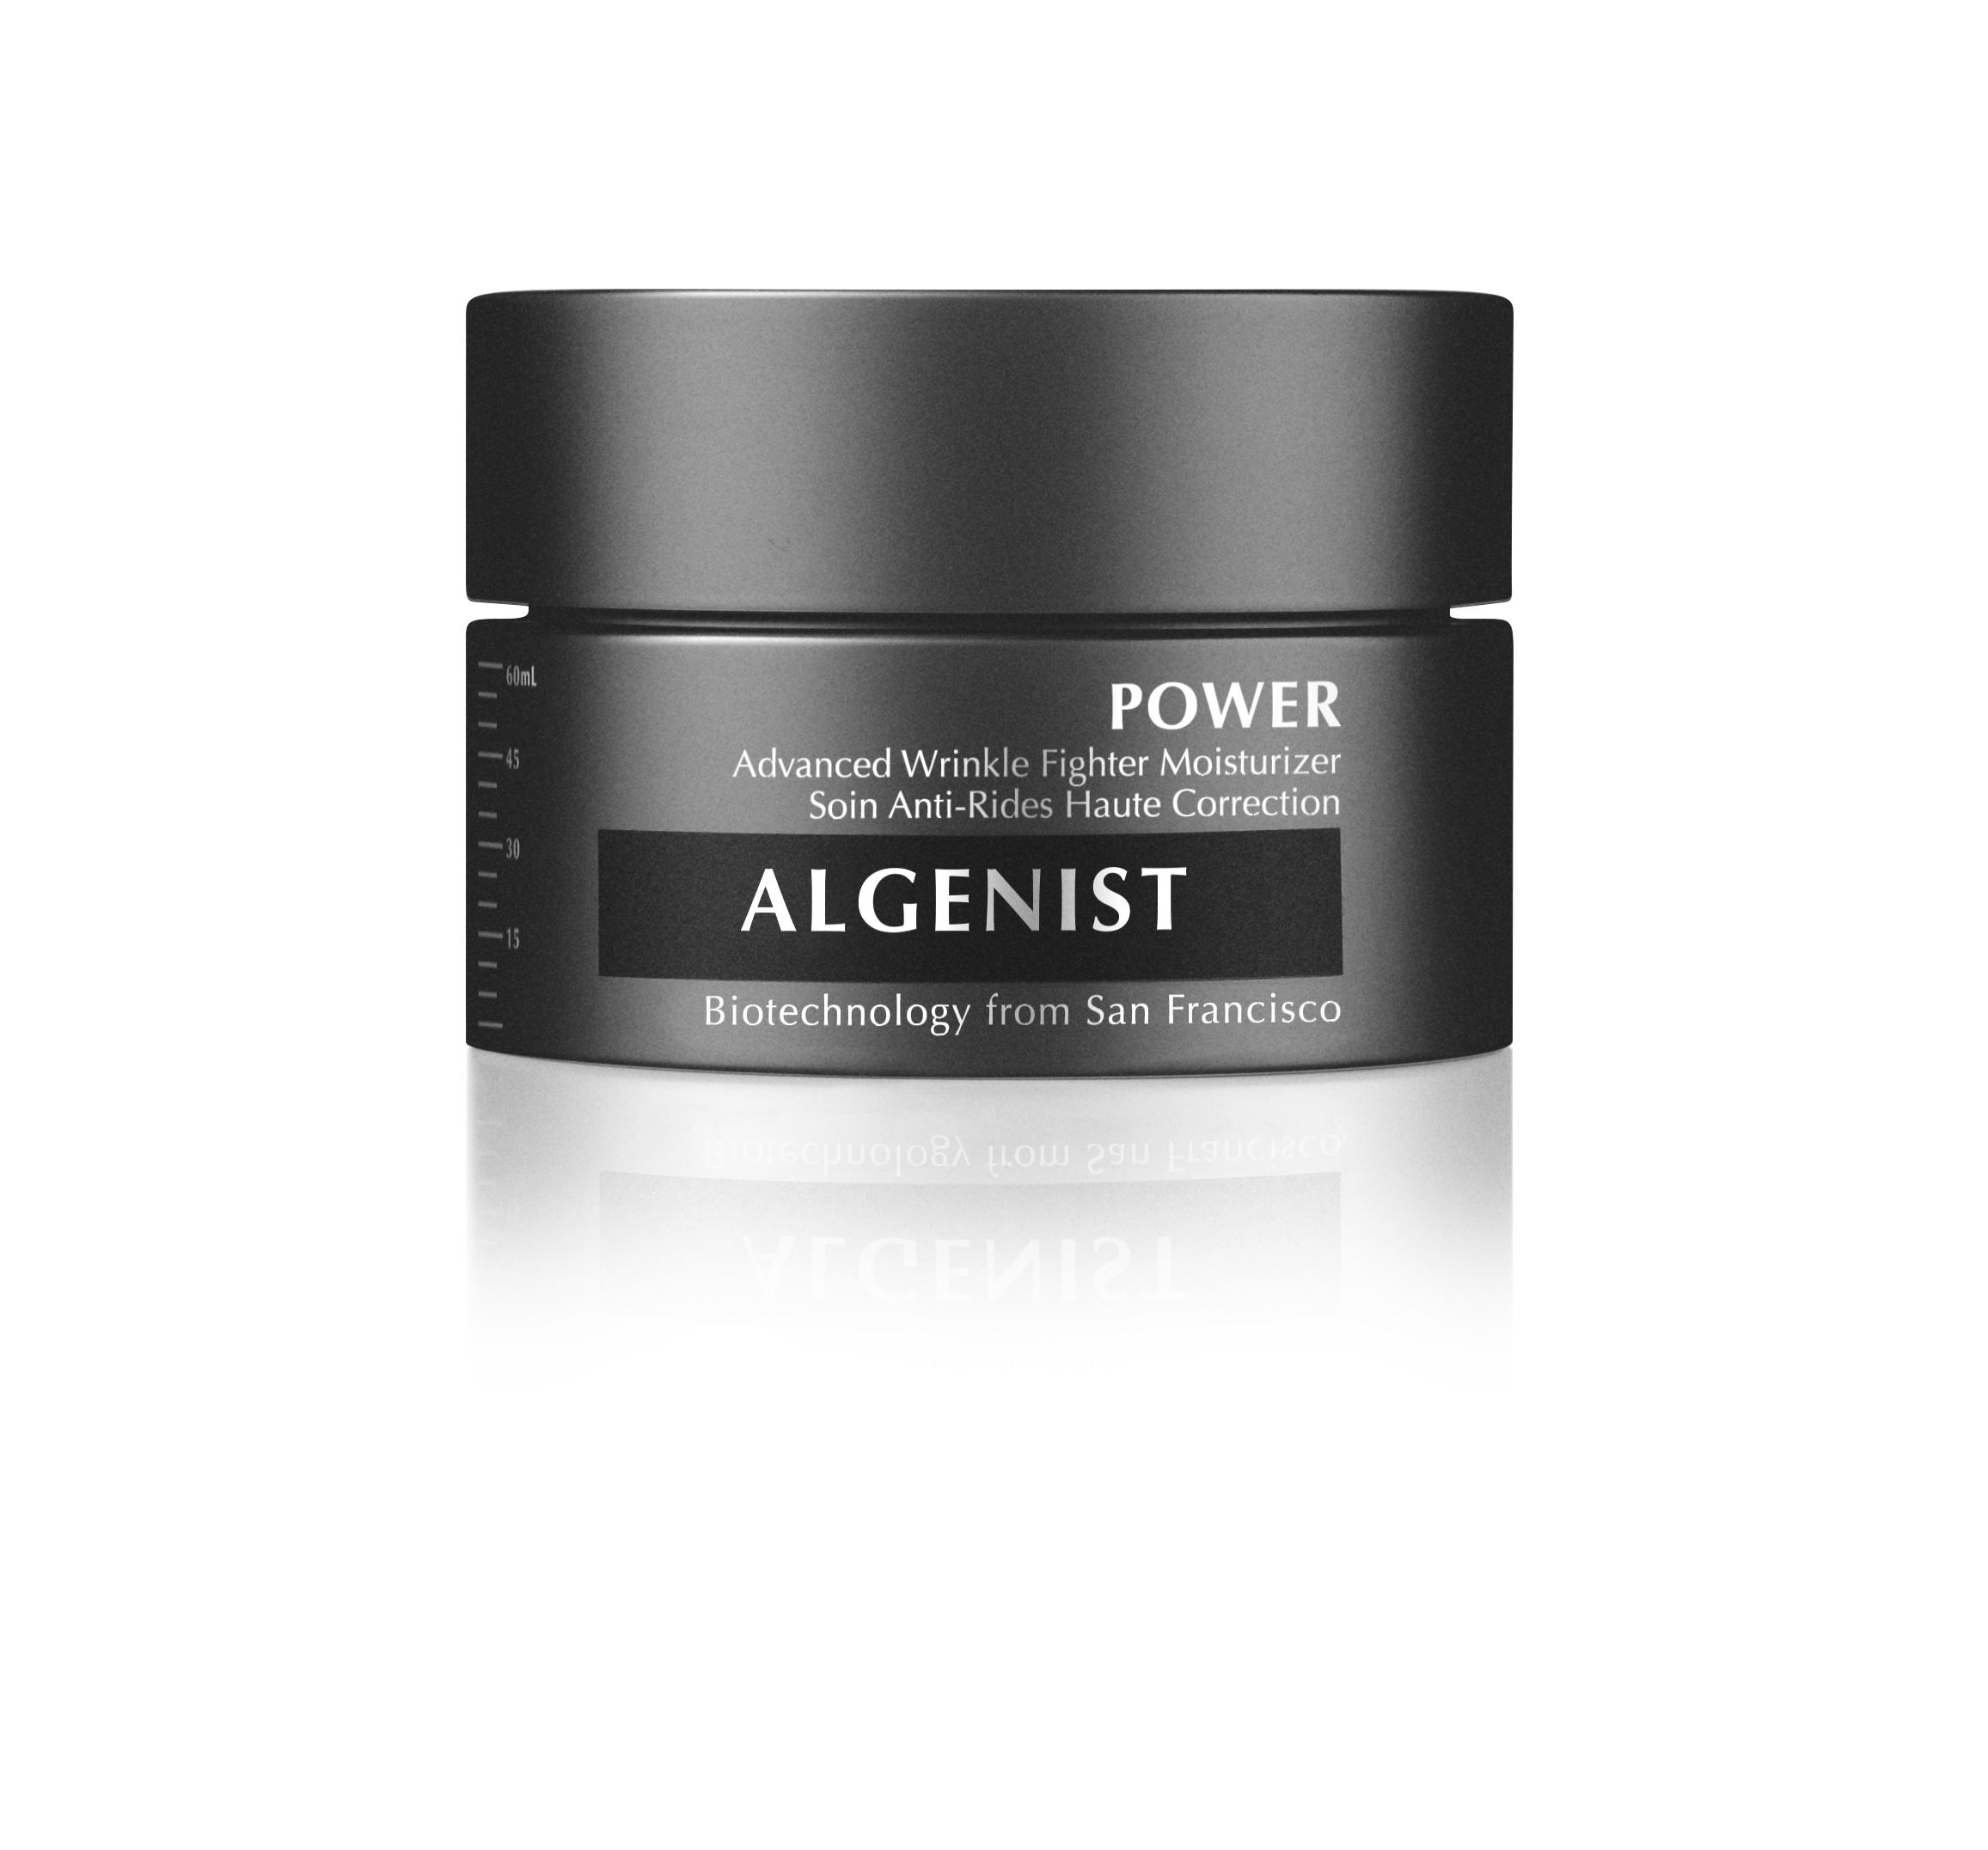 Algenist Power Advanced Wrinkle Fighter Moisturizer, 60 ml